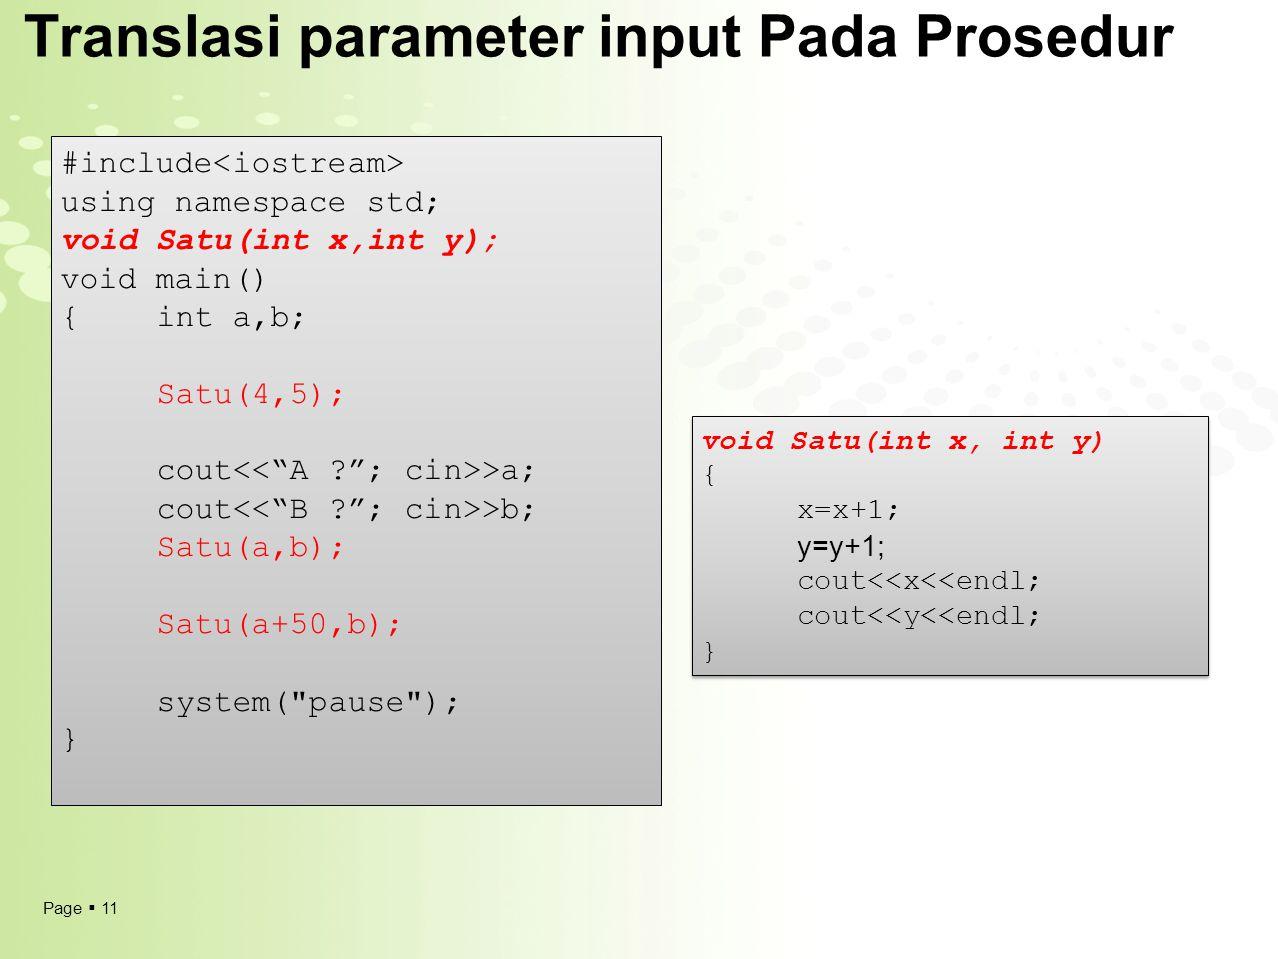 Translasi parameter input Pada Prosedur